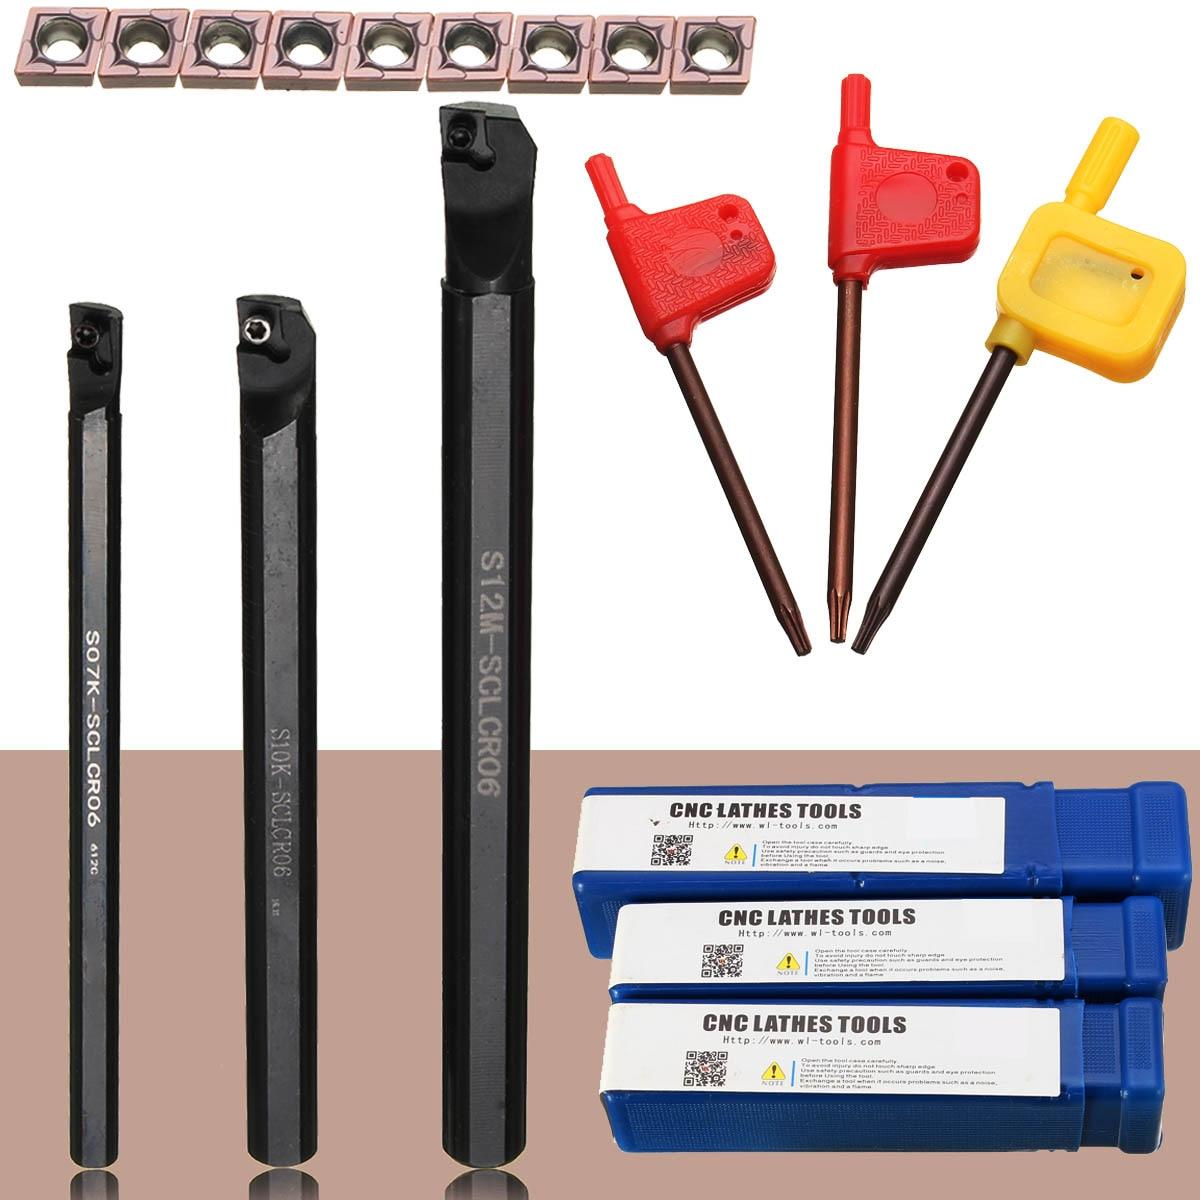 1pcs S07K SCLCR06+1pcs S10K SCLCR06+1pcs S12M SCLCR06 Lathe Holder Turning Tool Boring Bar 7/10/12mm + 10pcs CCMT0602 Inserts|Turning Tool| |  - title=